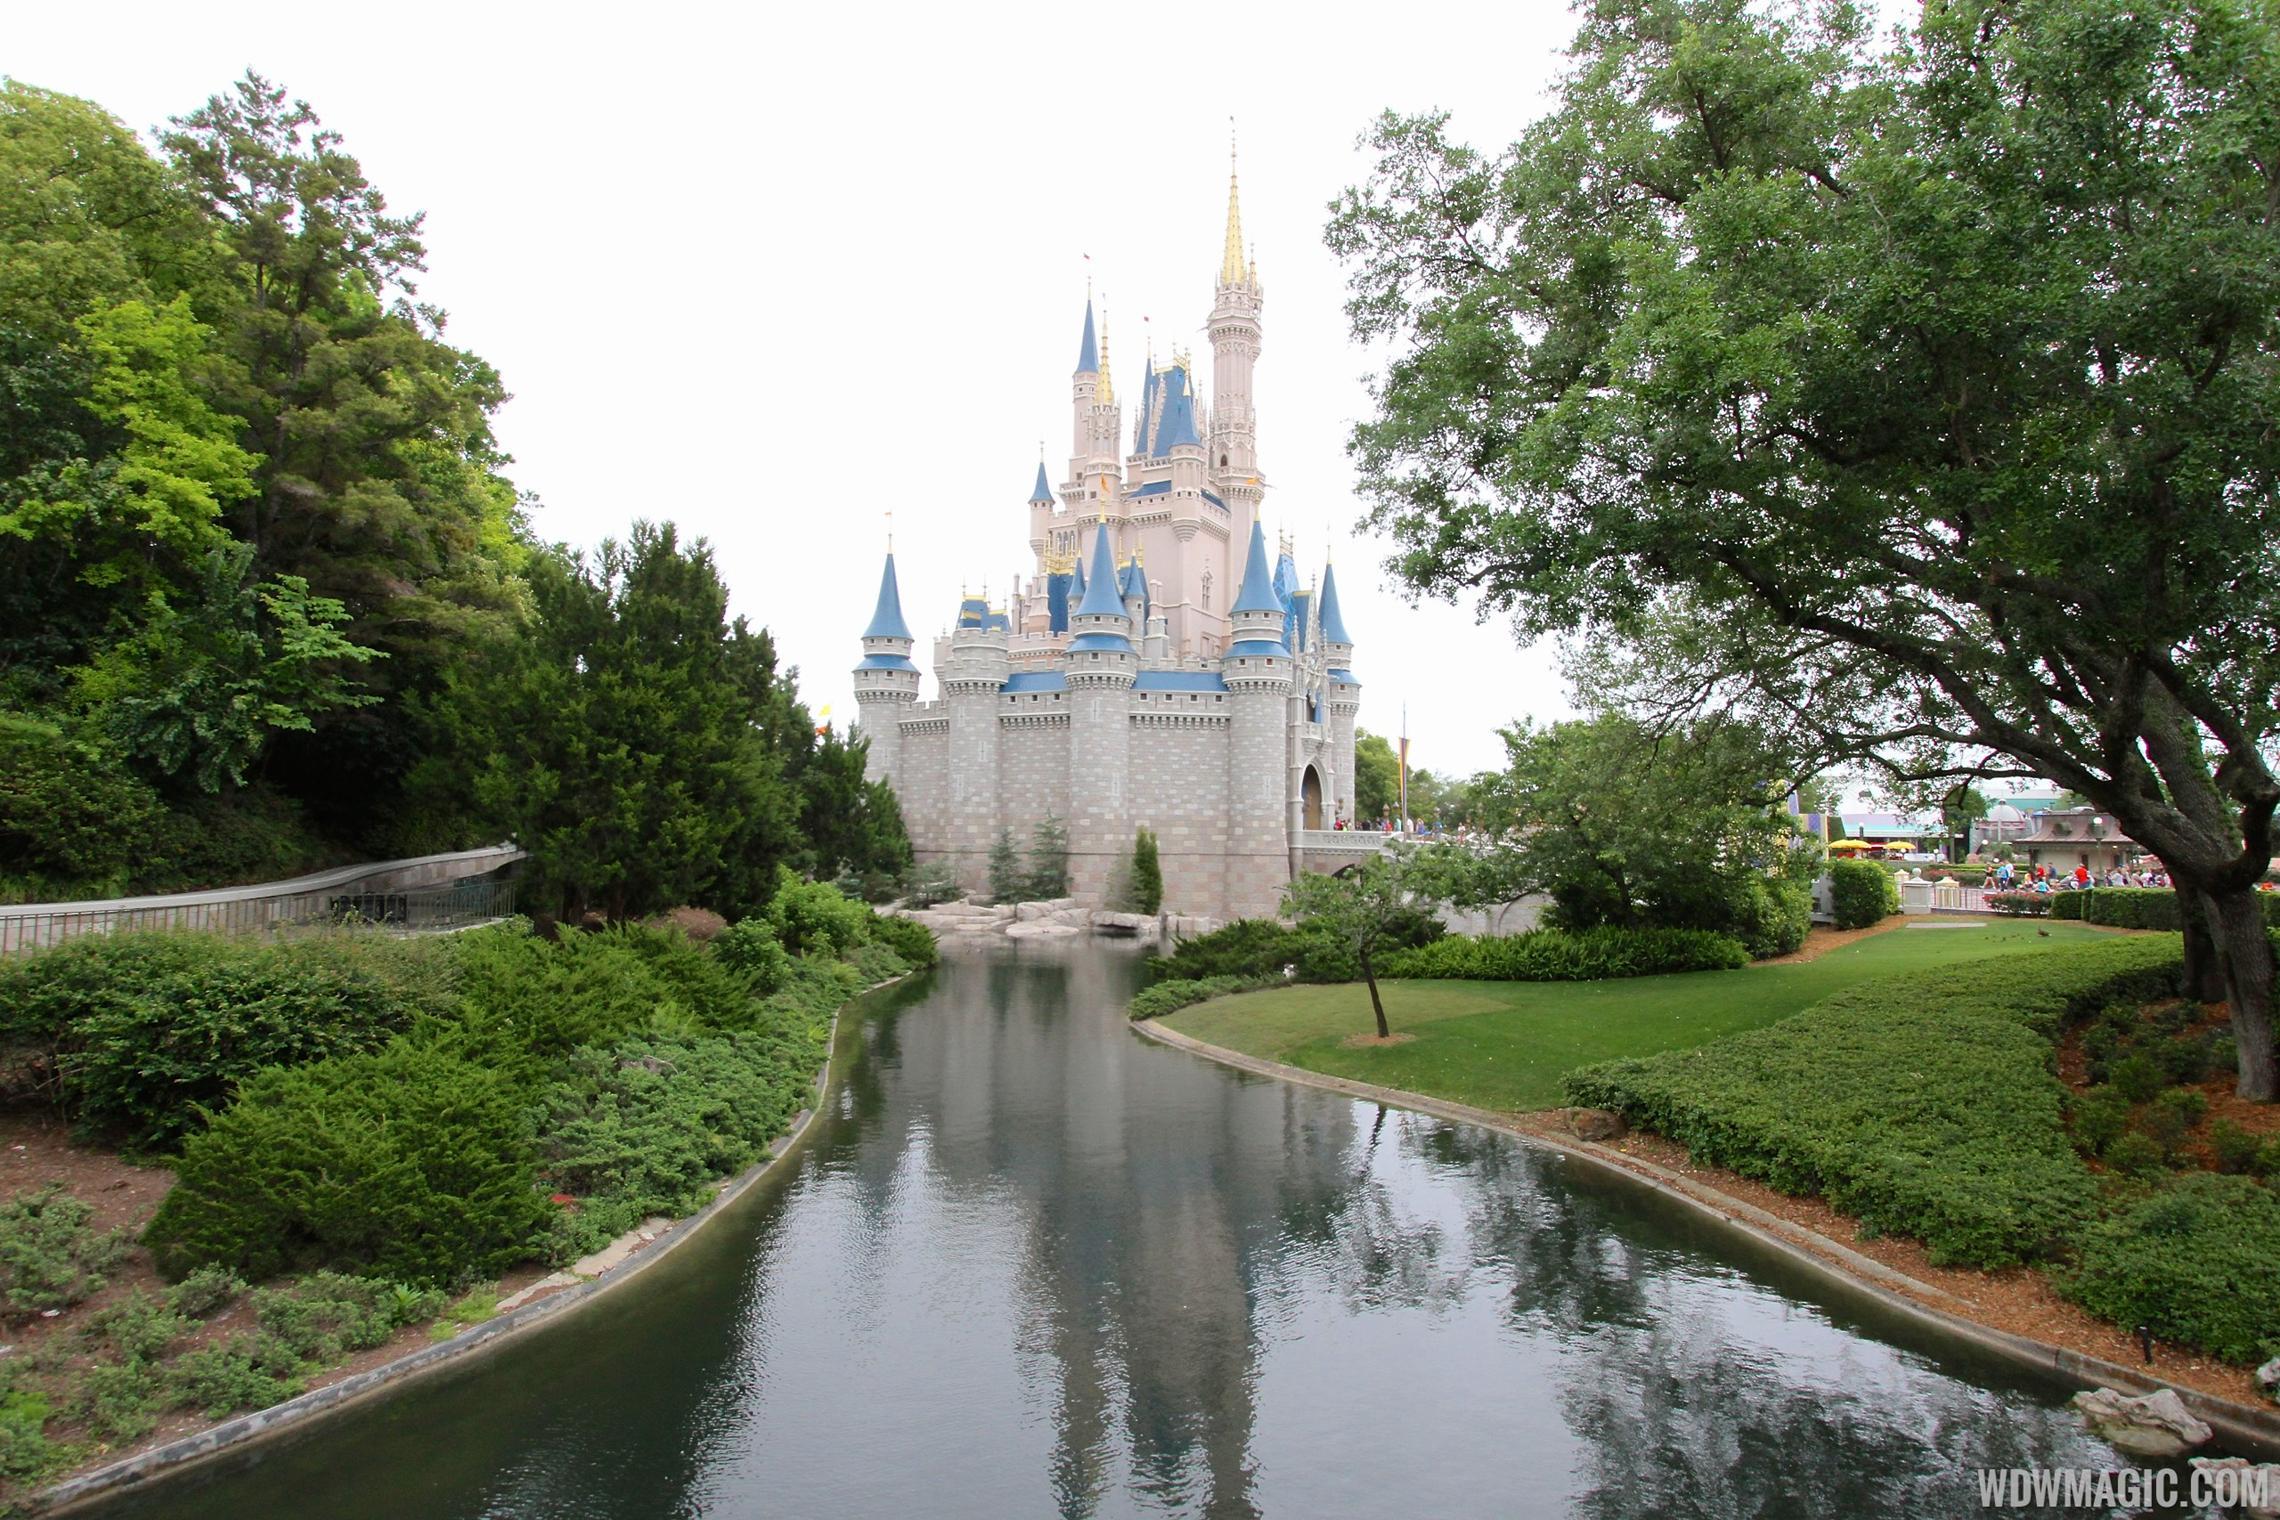 Water back in the Magic Kingdom's waterways